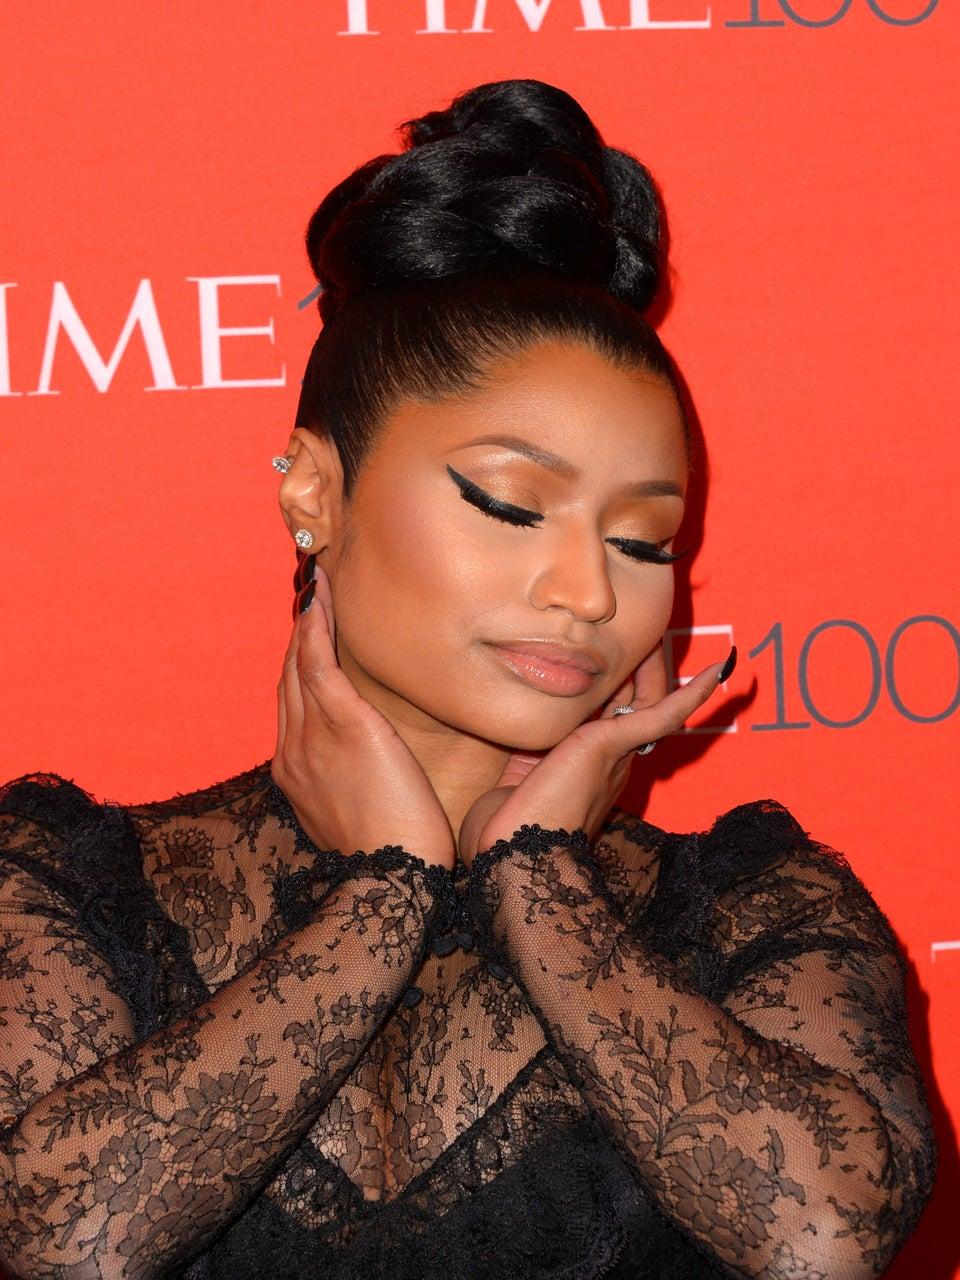 Did You See Nicki Minaj's Sleek Top Knot?